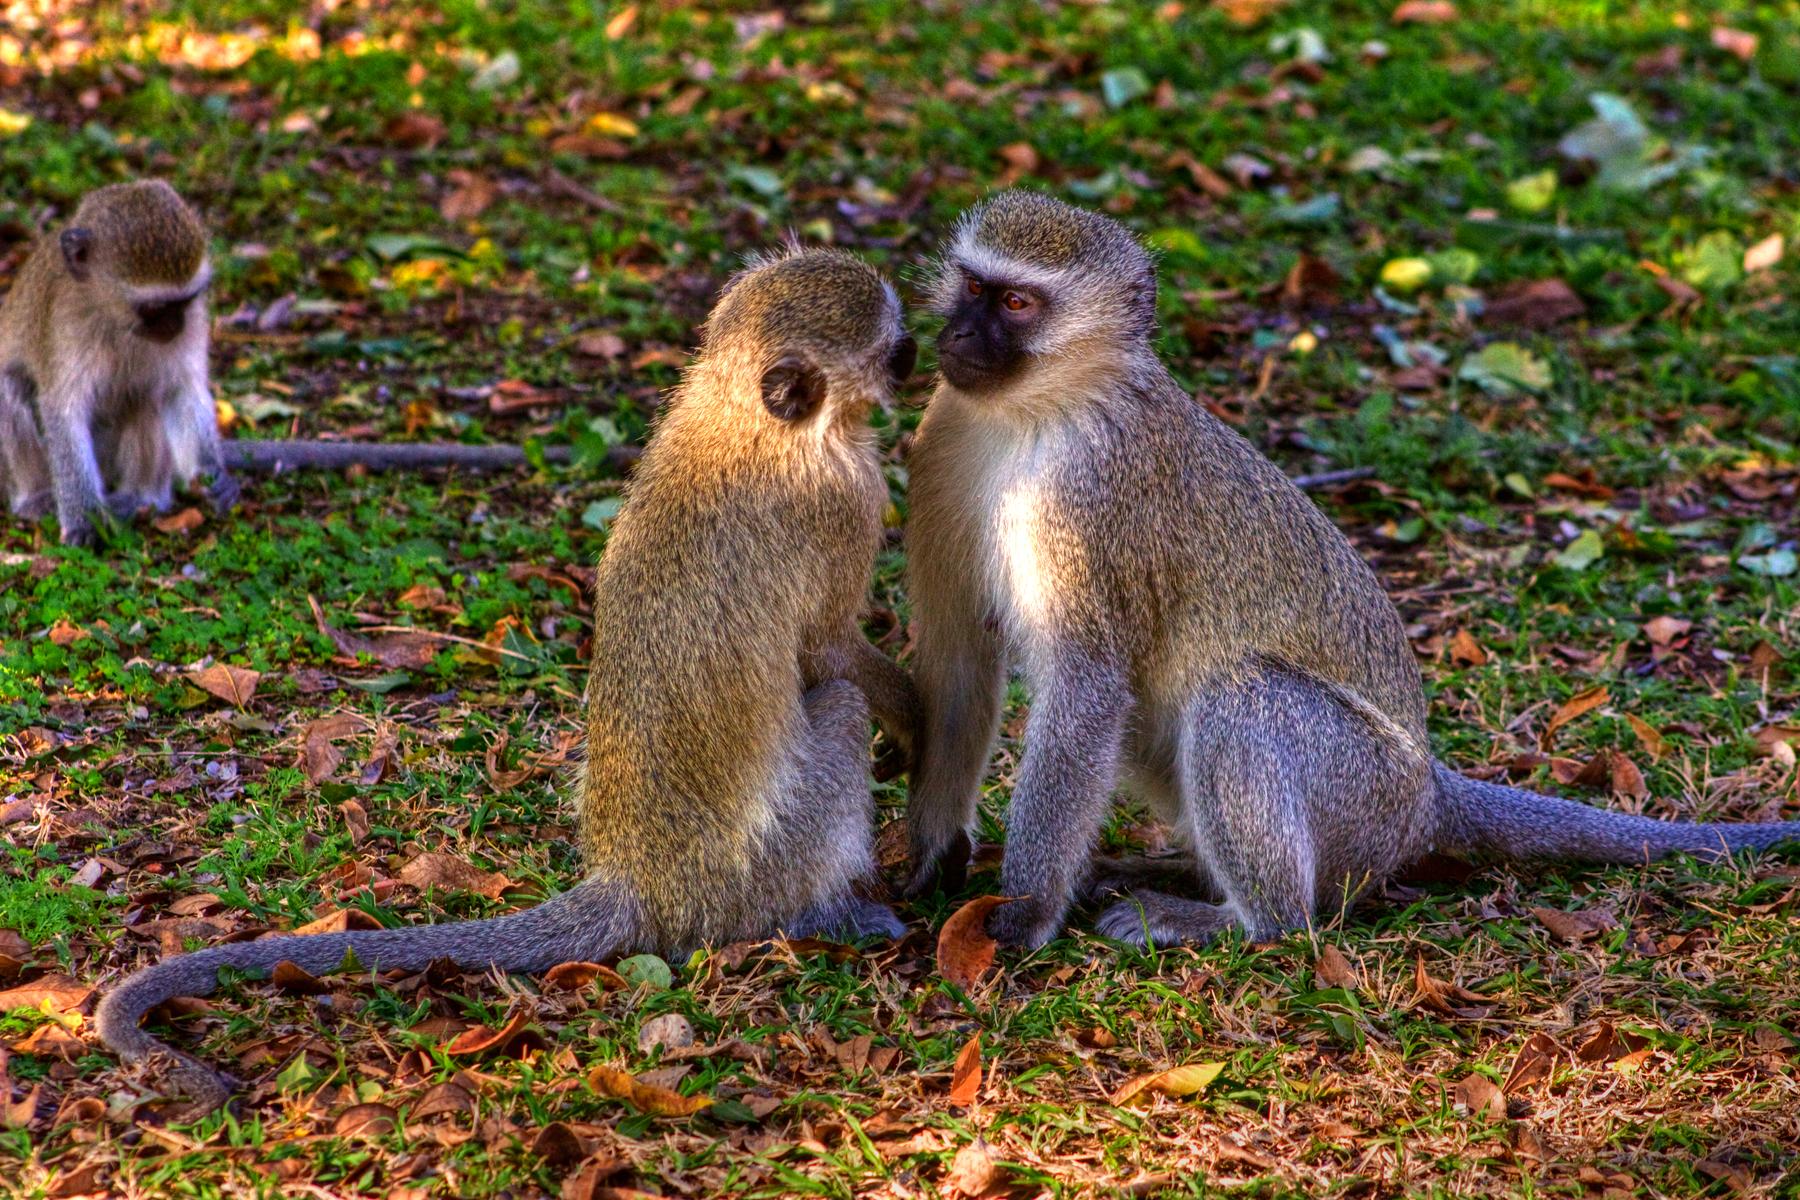 Vervet Monkeys, Africa, Resource, Natural, Nature, HQ Photo